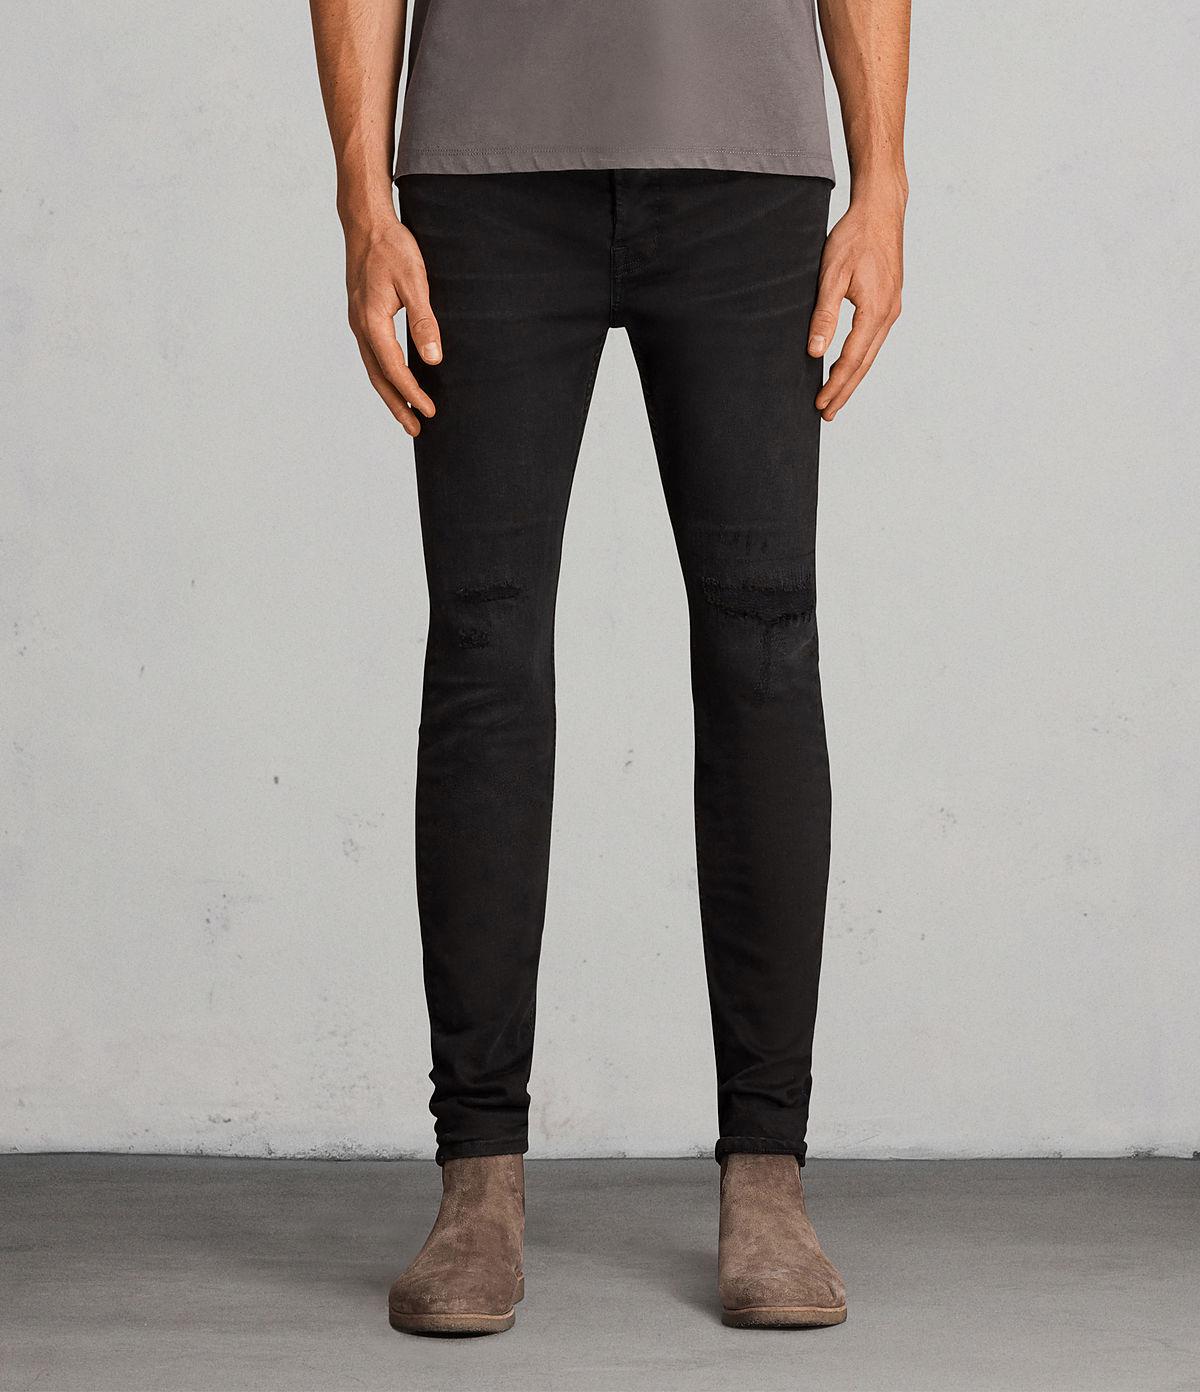 bixby-cigarette-jeans